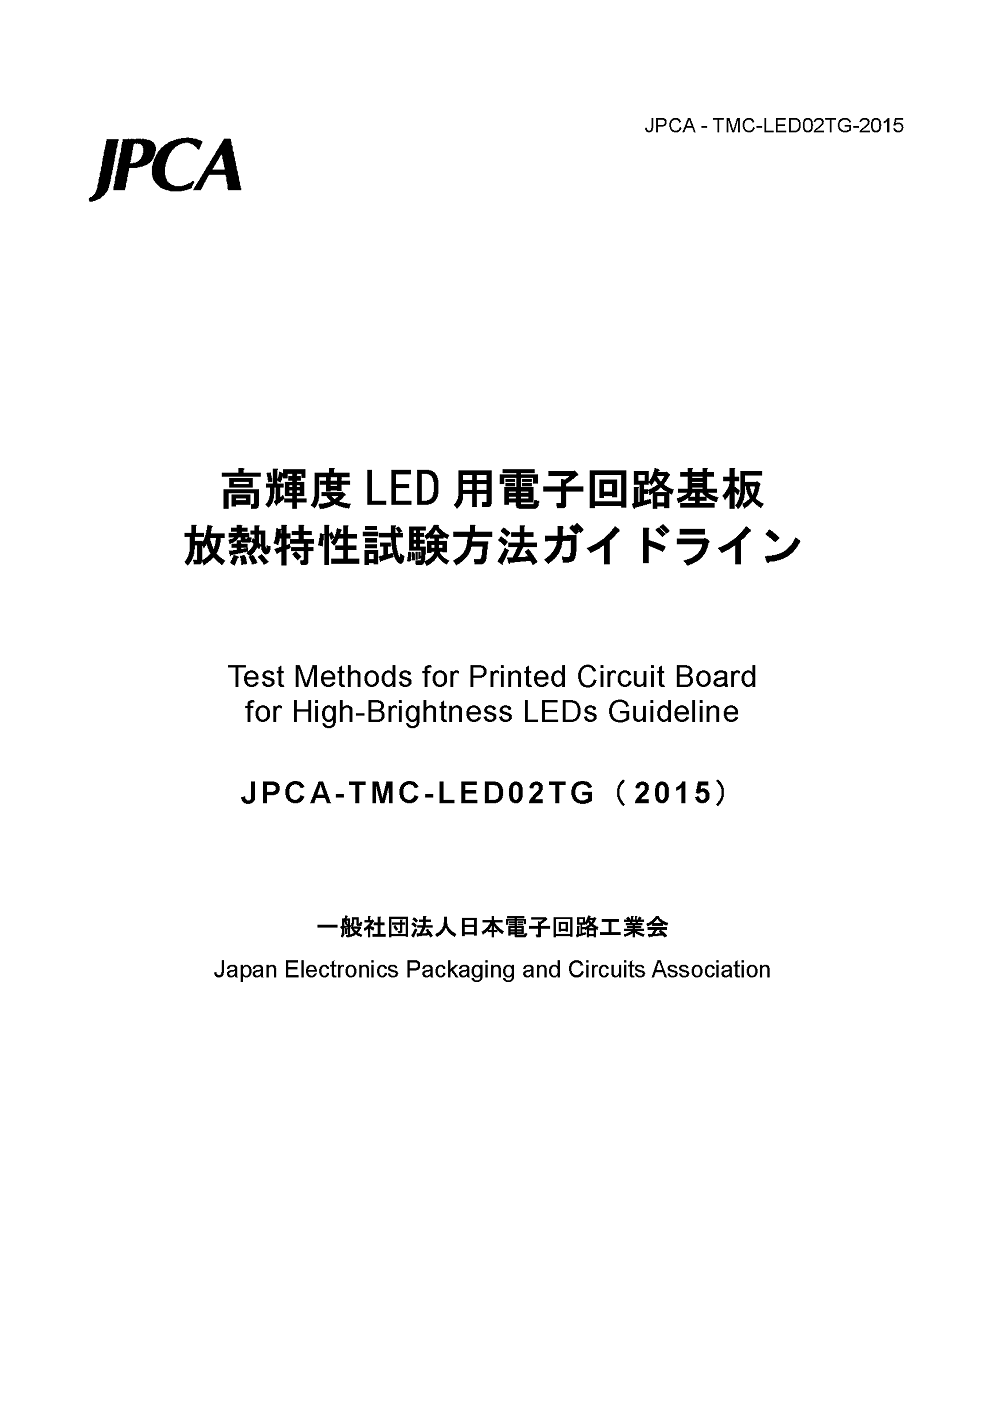 JPCA-TMC-LED02TG-2015